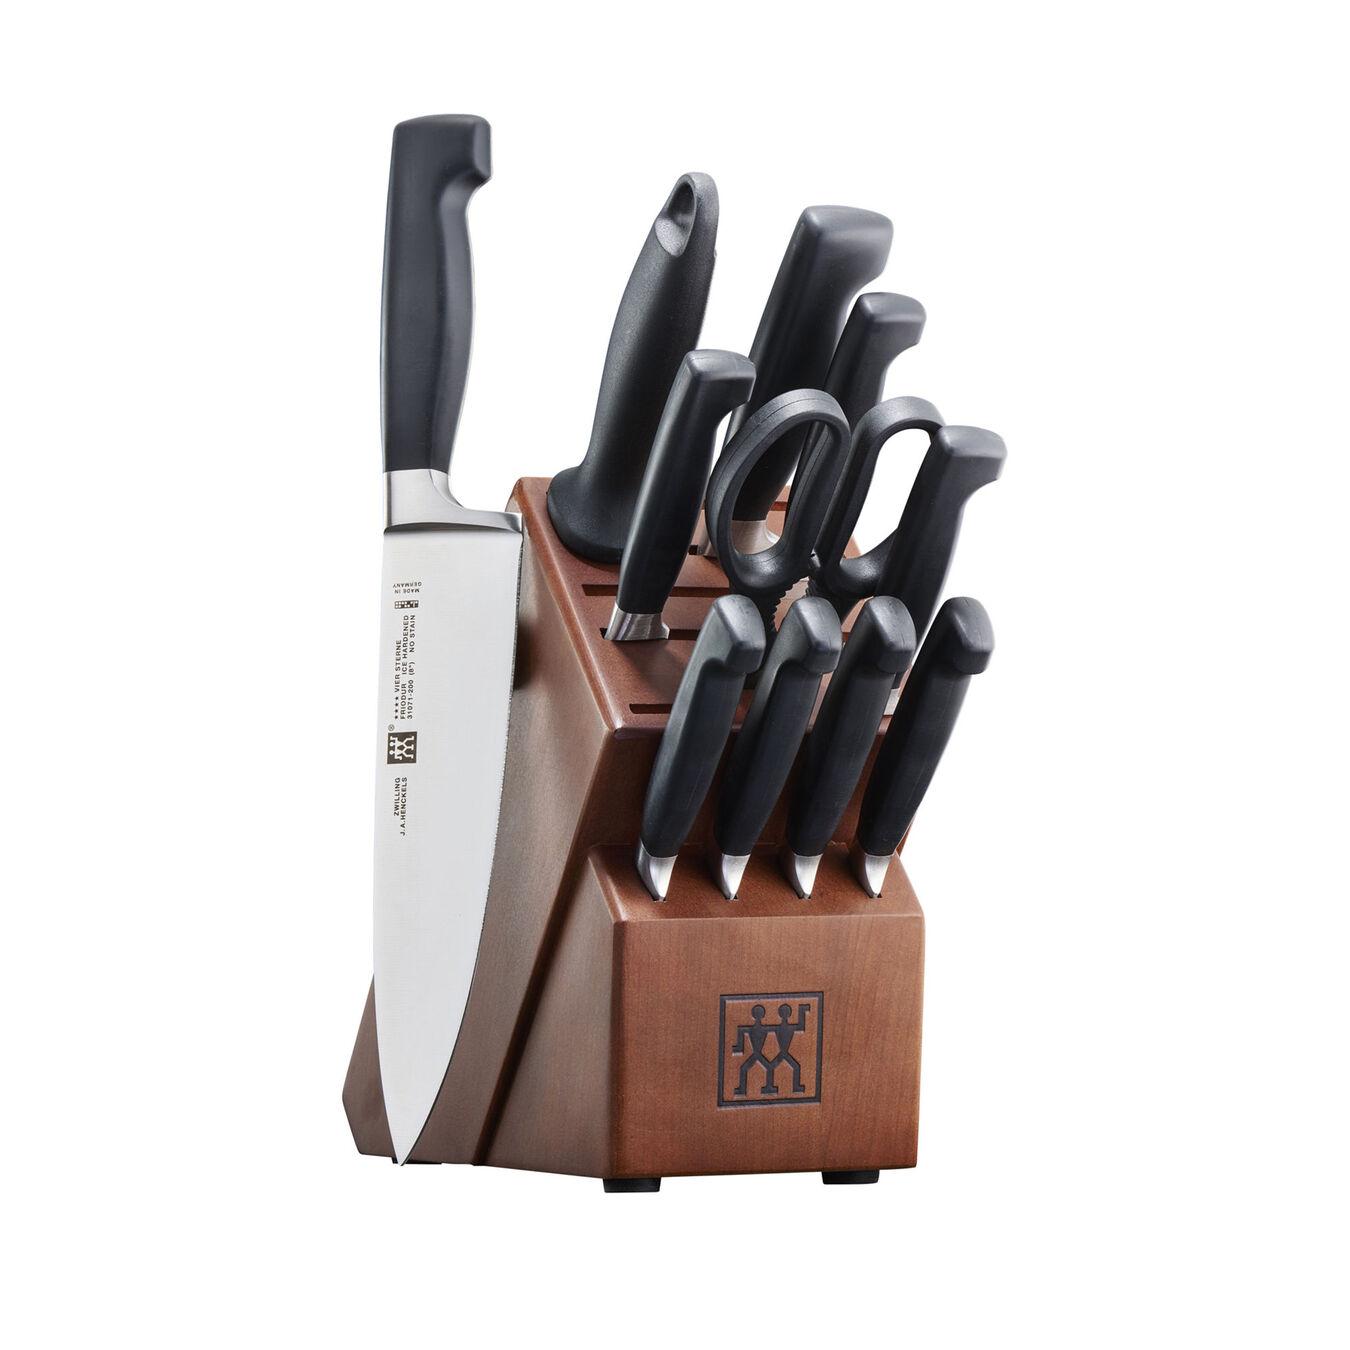 13-pc, Knife block set, Walnut,,large 1